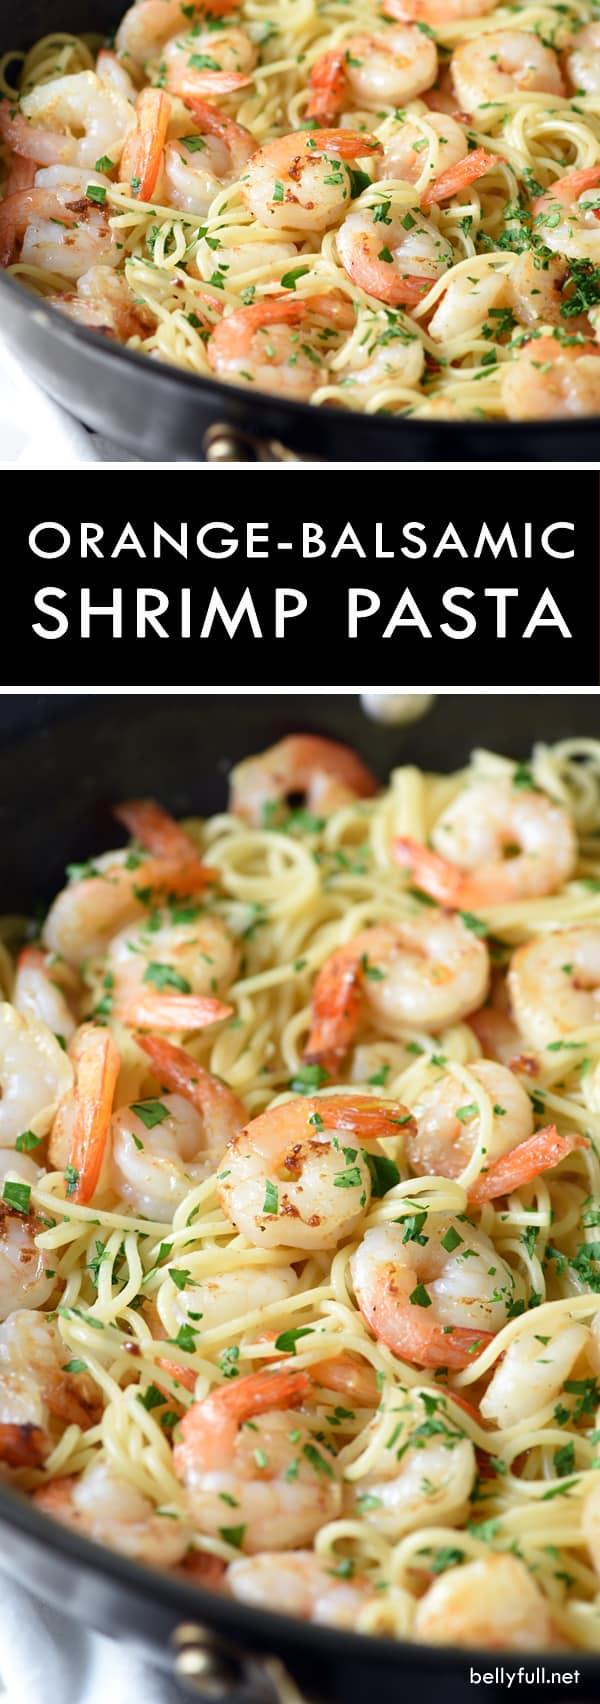 Orange-Balsamic Shrimp Pasta